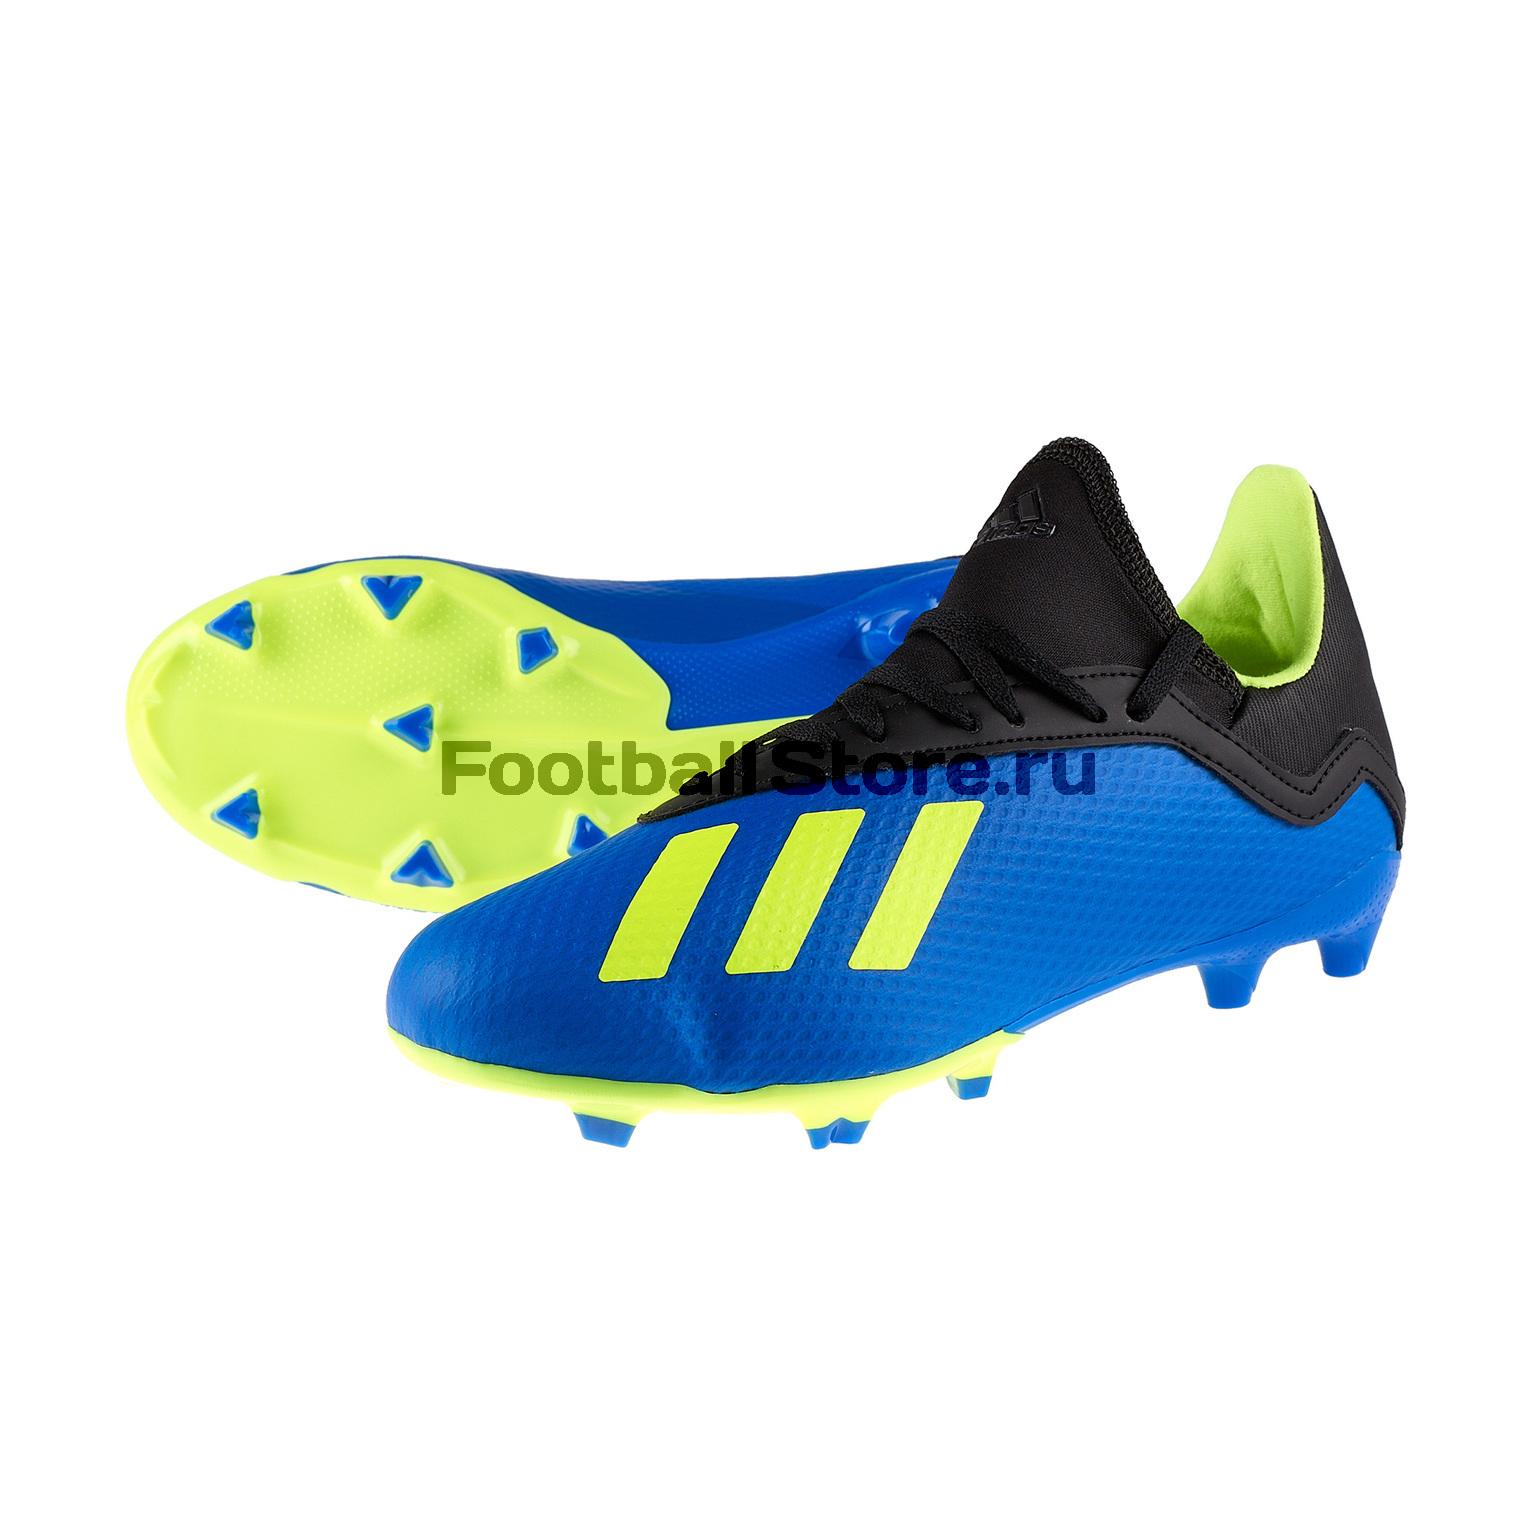 Бутсы детские Adidas X 18.3 FG DB2416 бутсы adidas x 17 1 fg bb6353